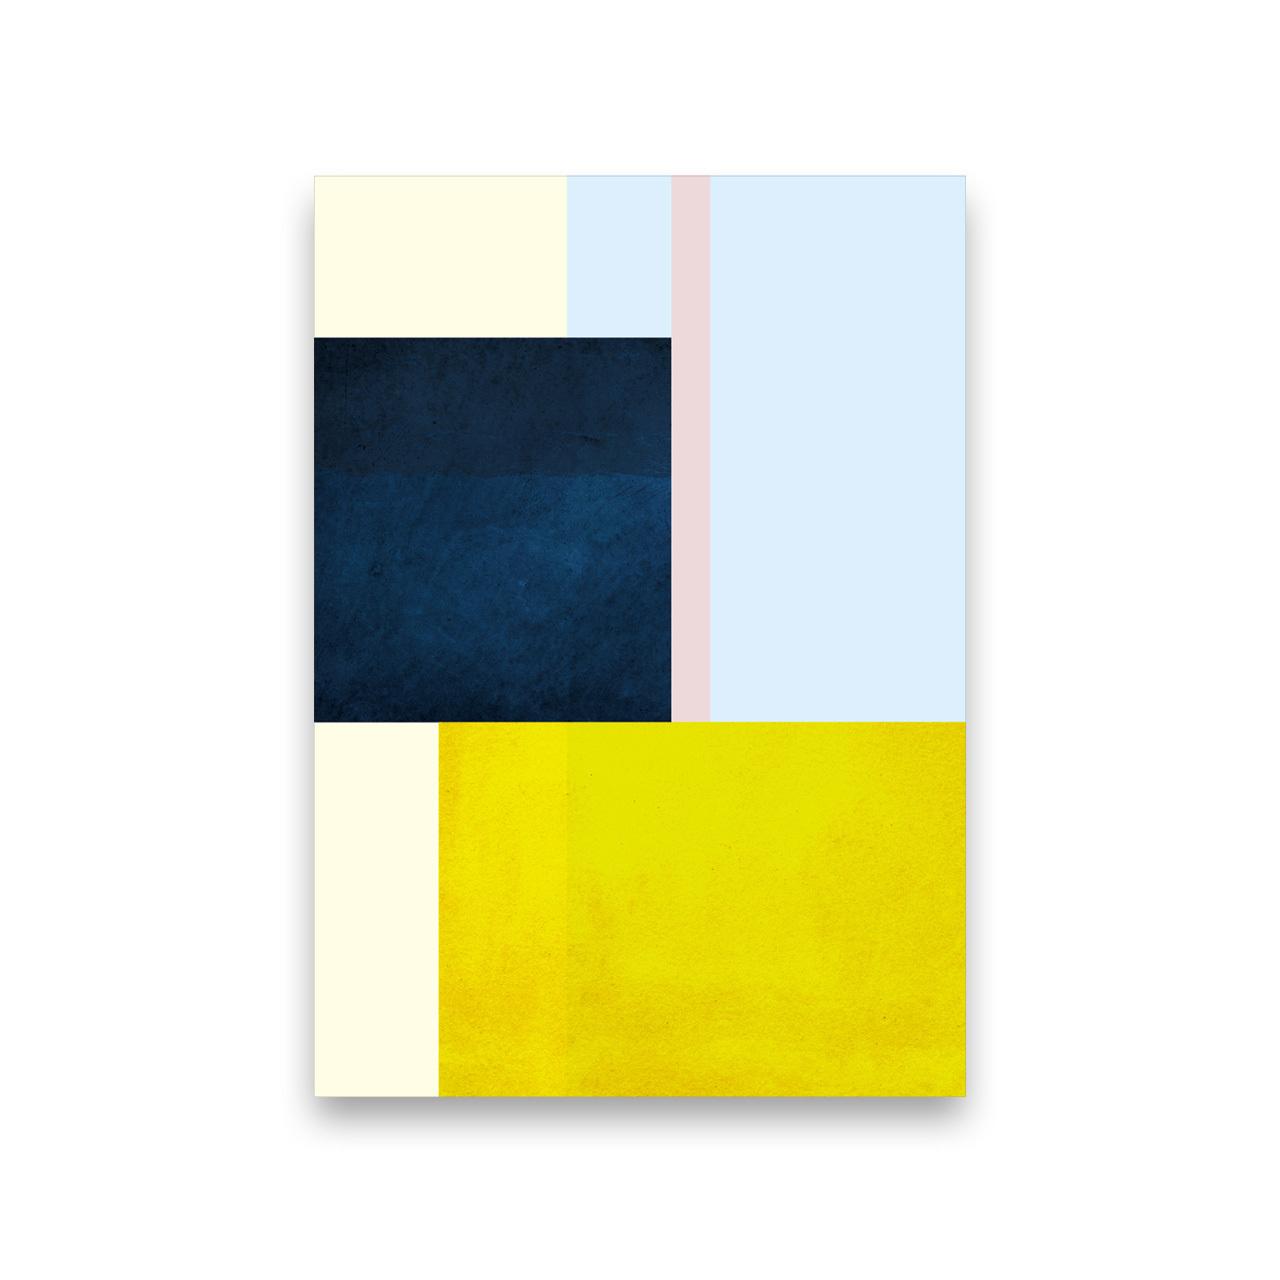 square_blue&yellow